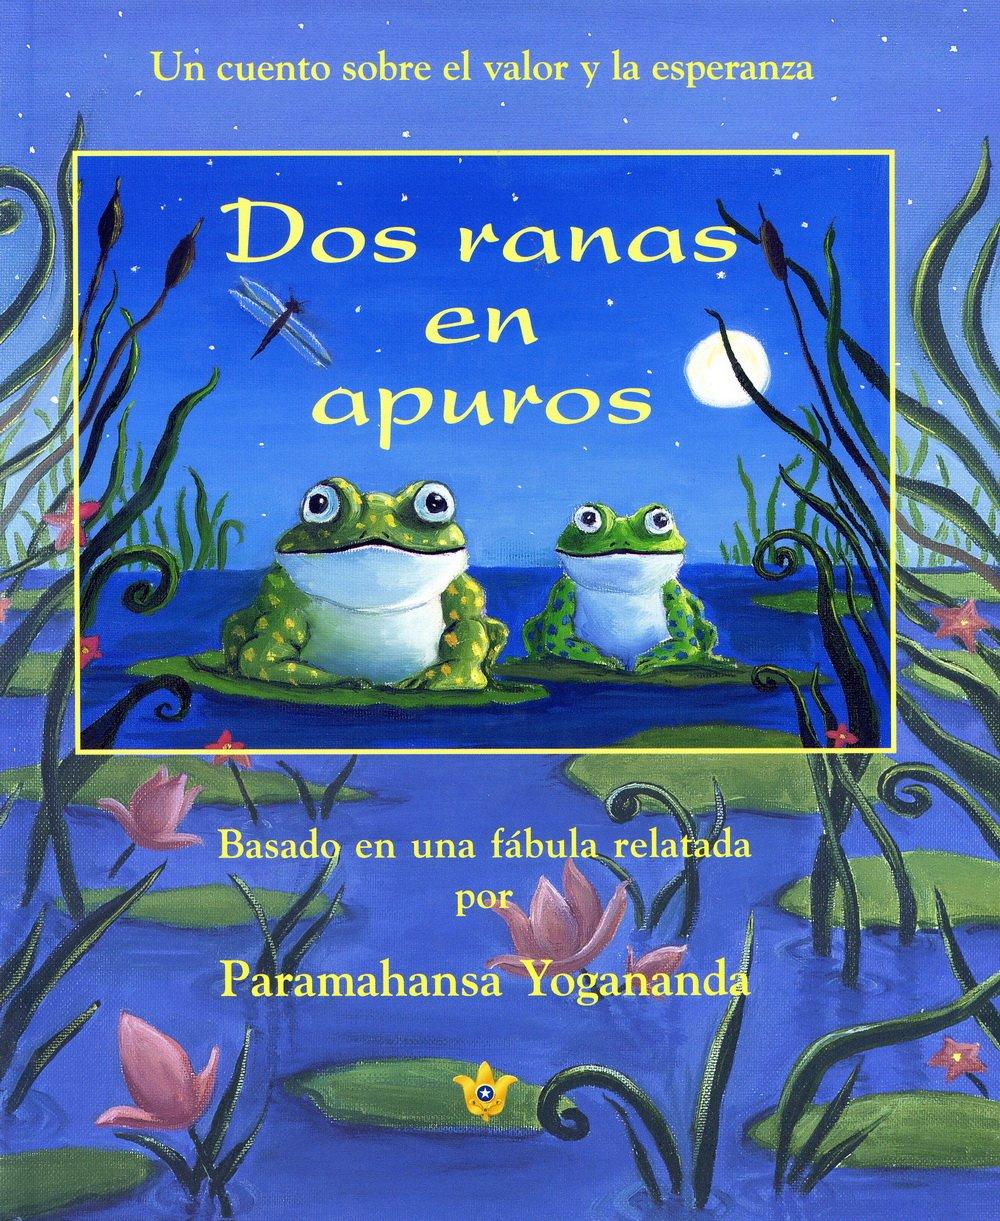 Dos ranas en apuros (Two Frogs in Trouble) (Spanish Edition) pdf epub